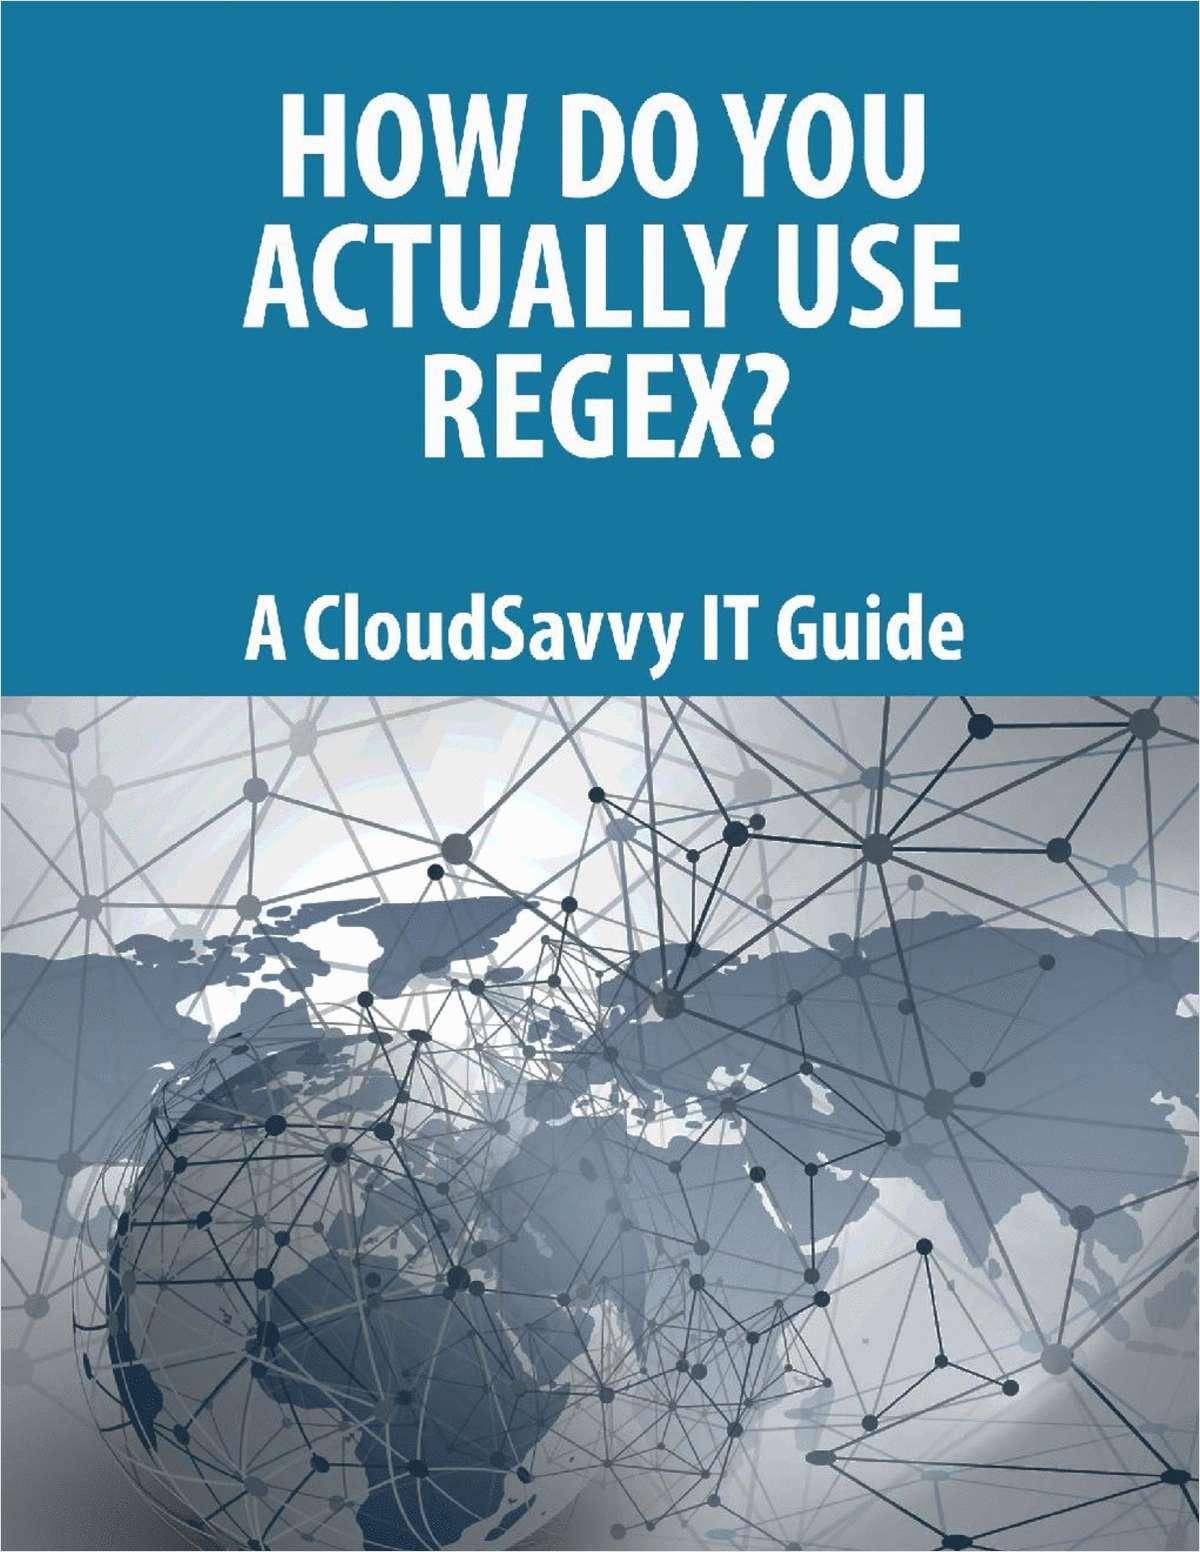 How Do You Actually Use Regex?